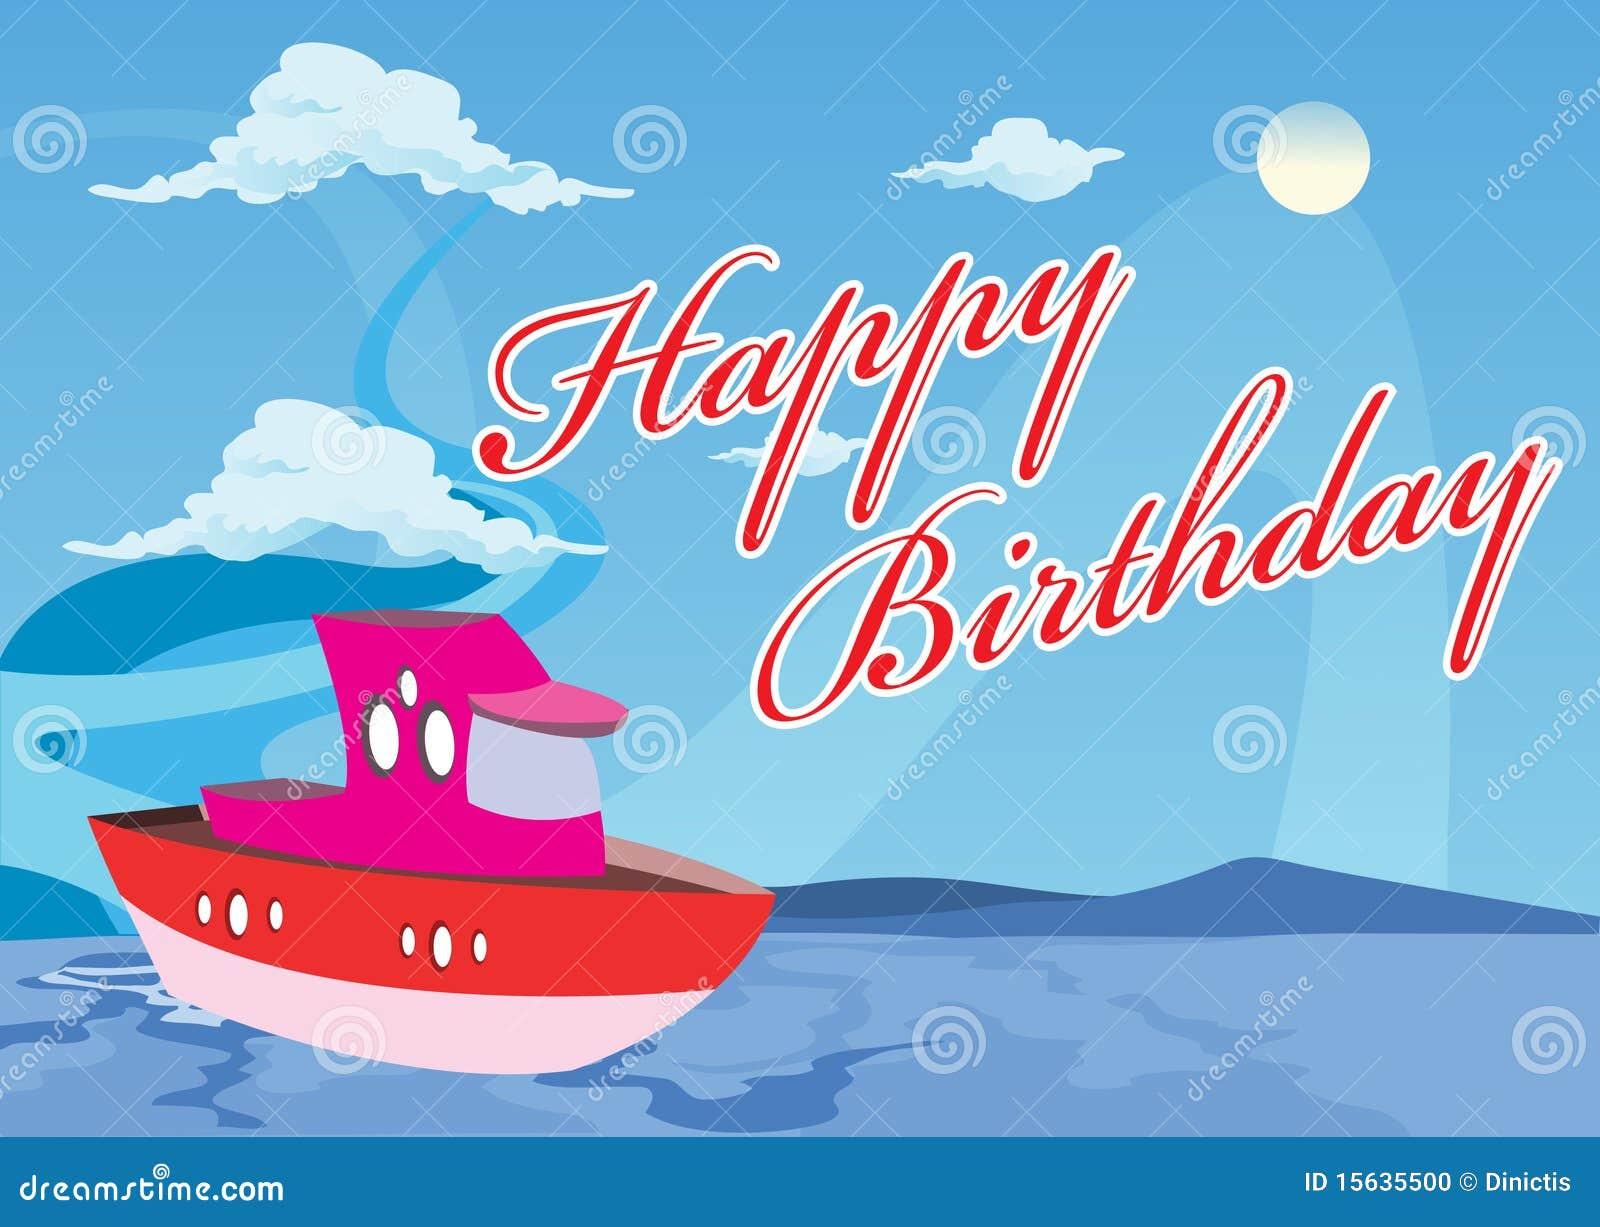 happy birthday boat stock vector illustration of clipart yacht clip art free yacht clip art pic